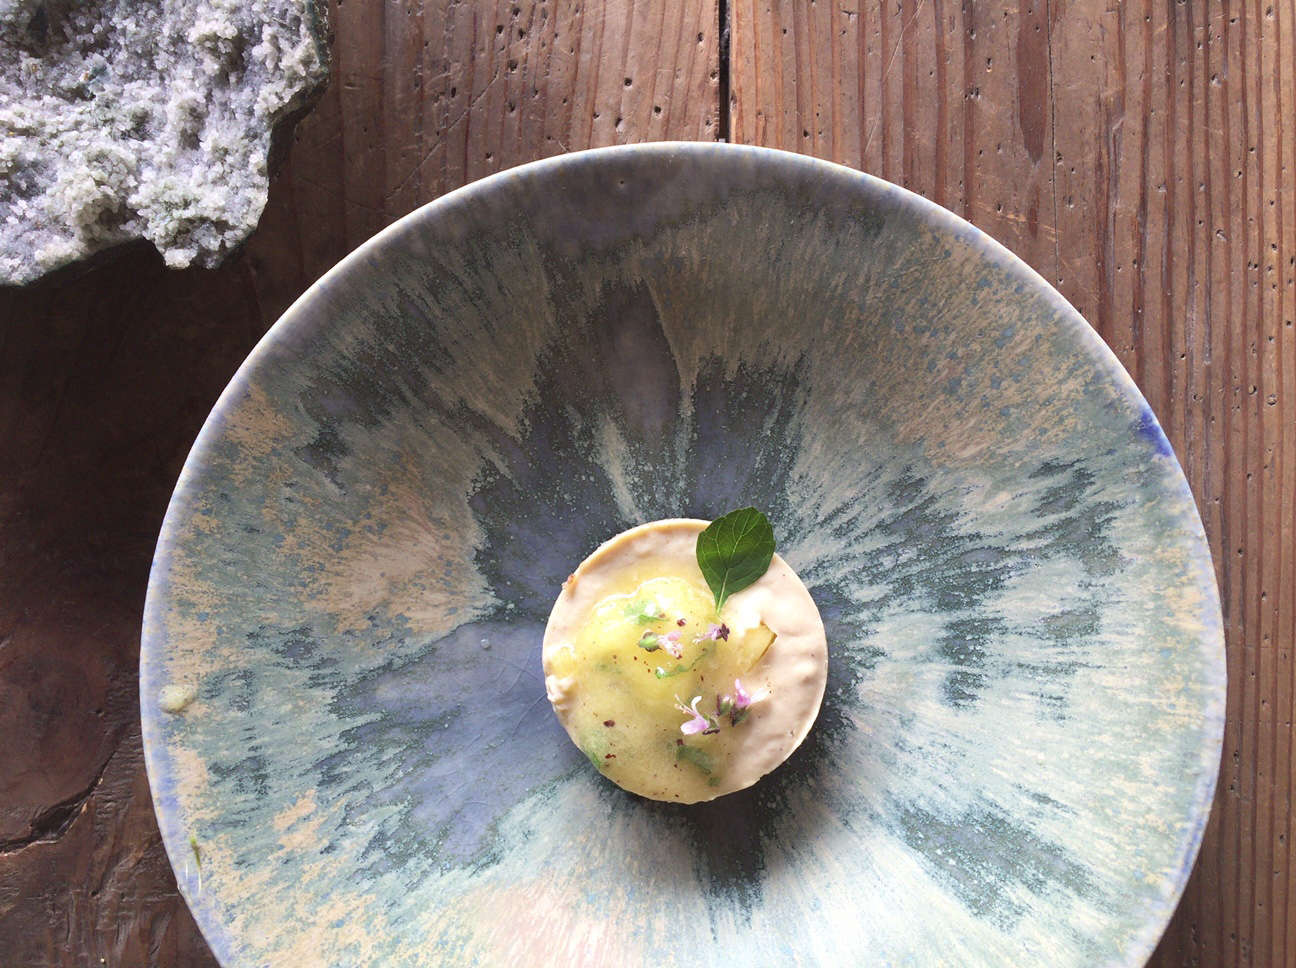 Japanese ceramic bowl by Shinsaku Nakazono at Stardust vegetarian cafe in Kyoto